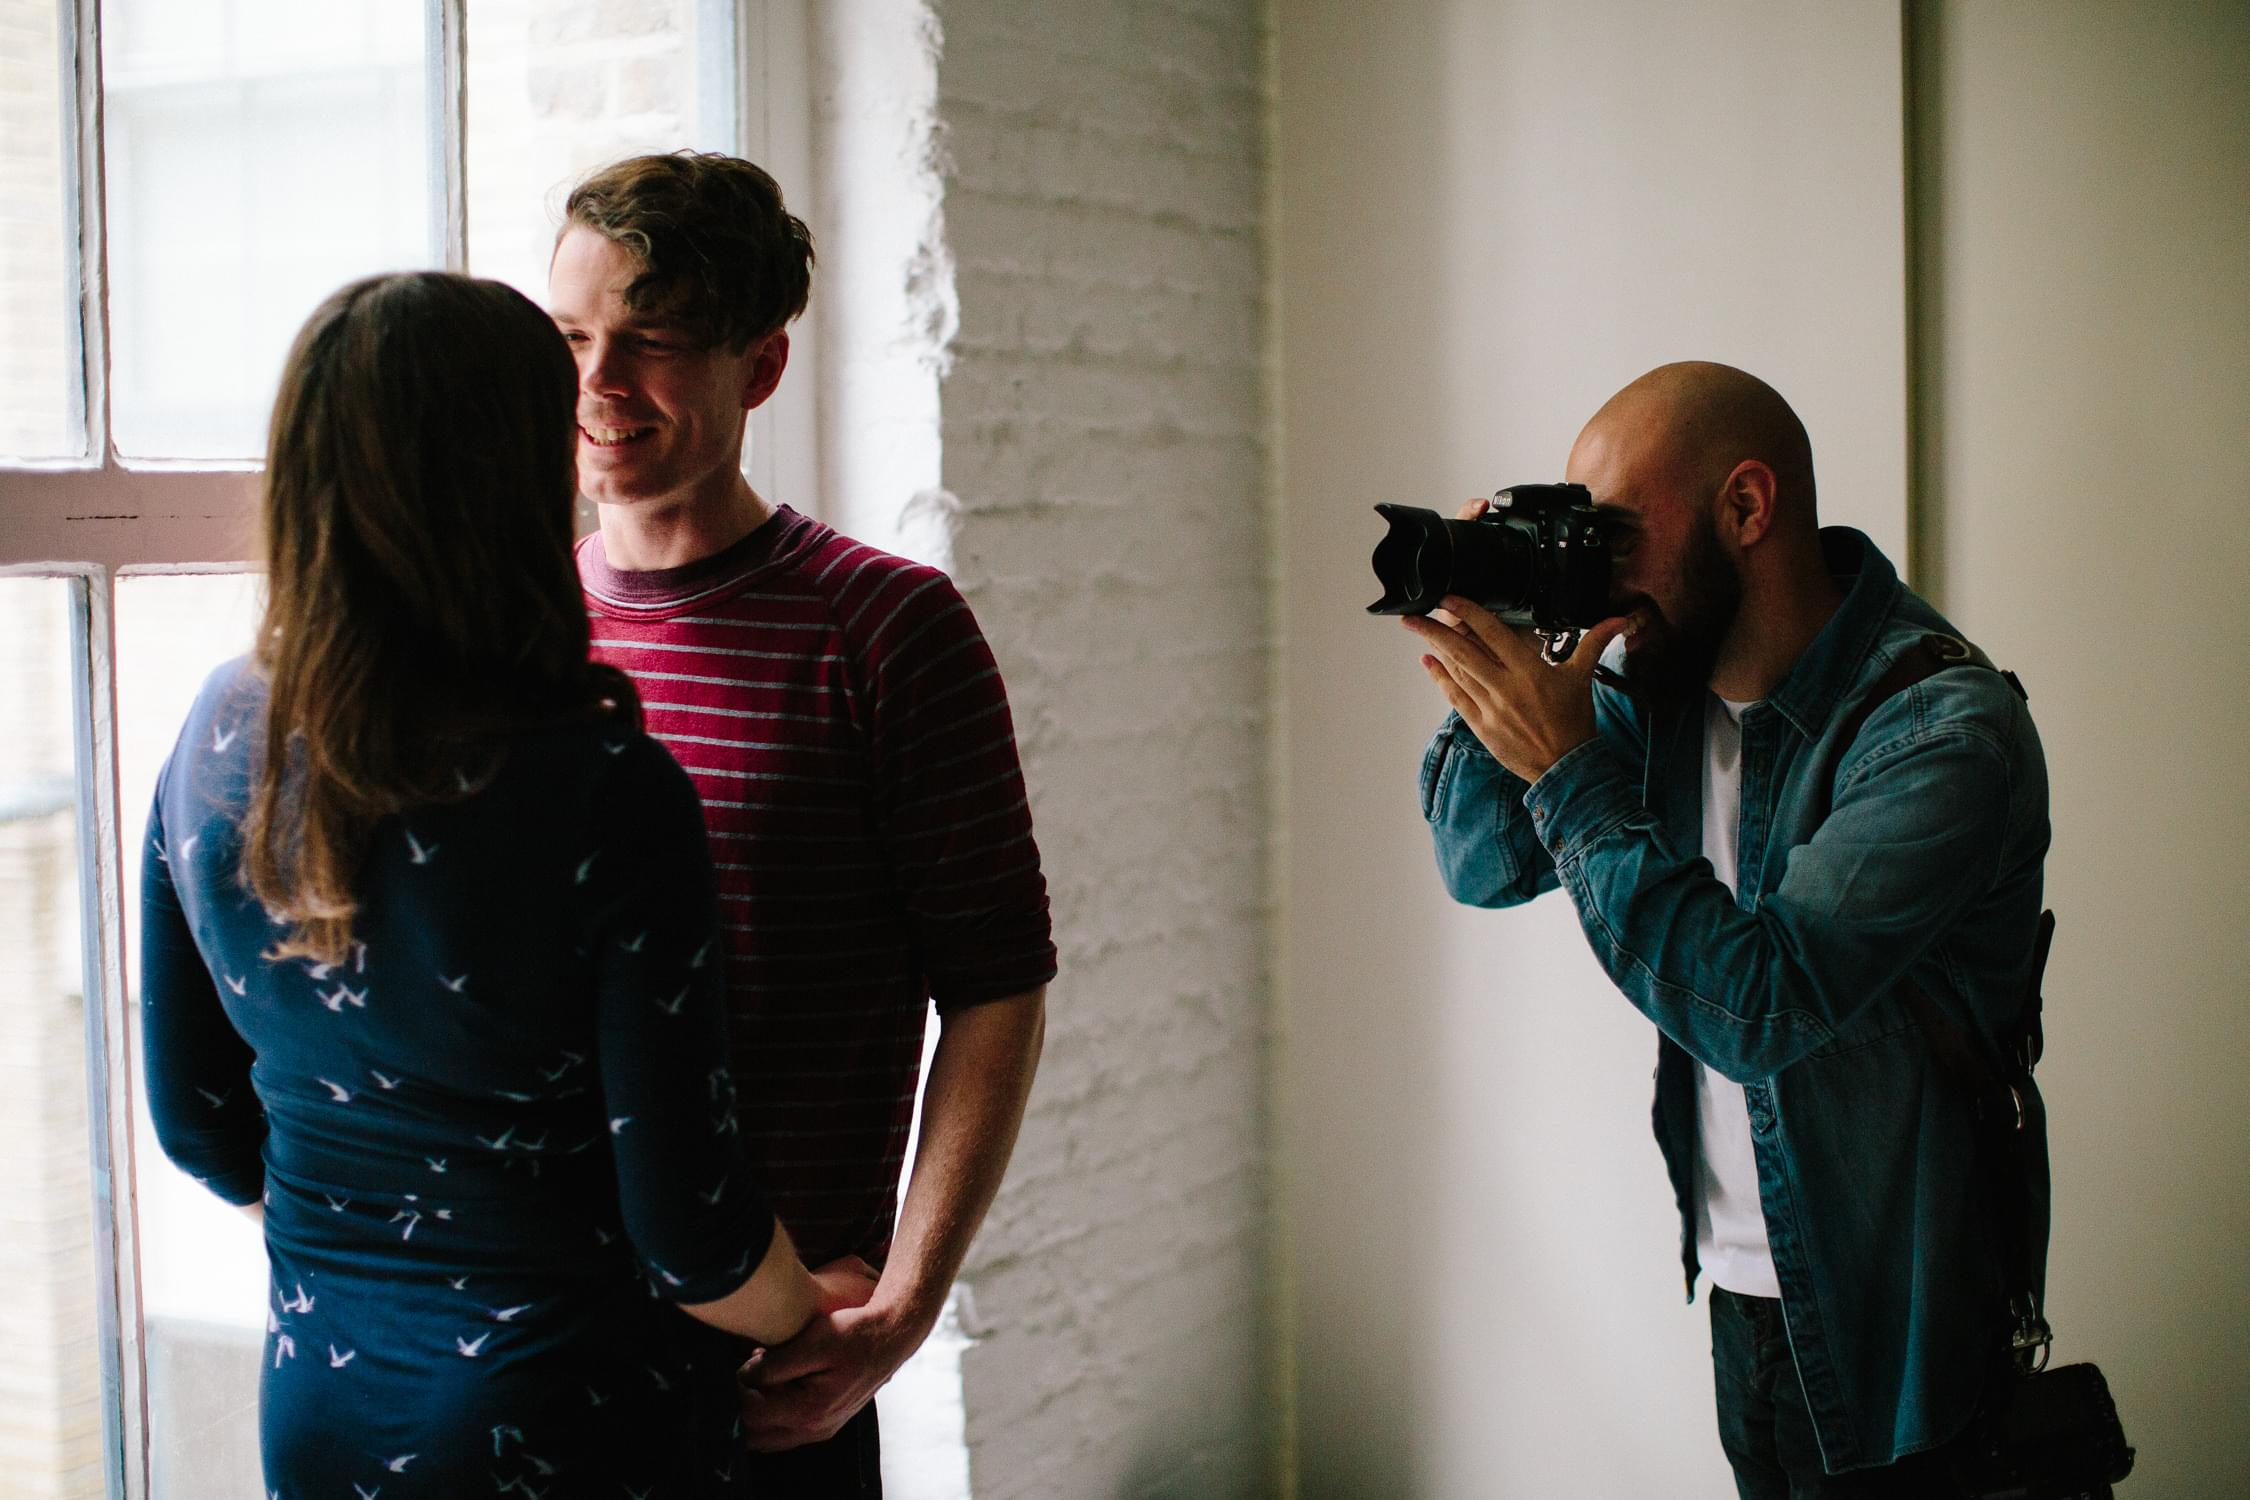 share-the-journey-london-wedding-photography-workshop-7